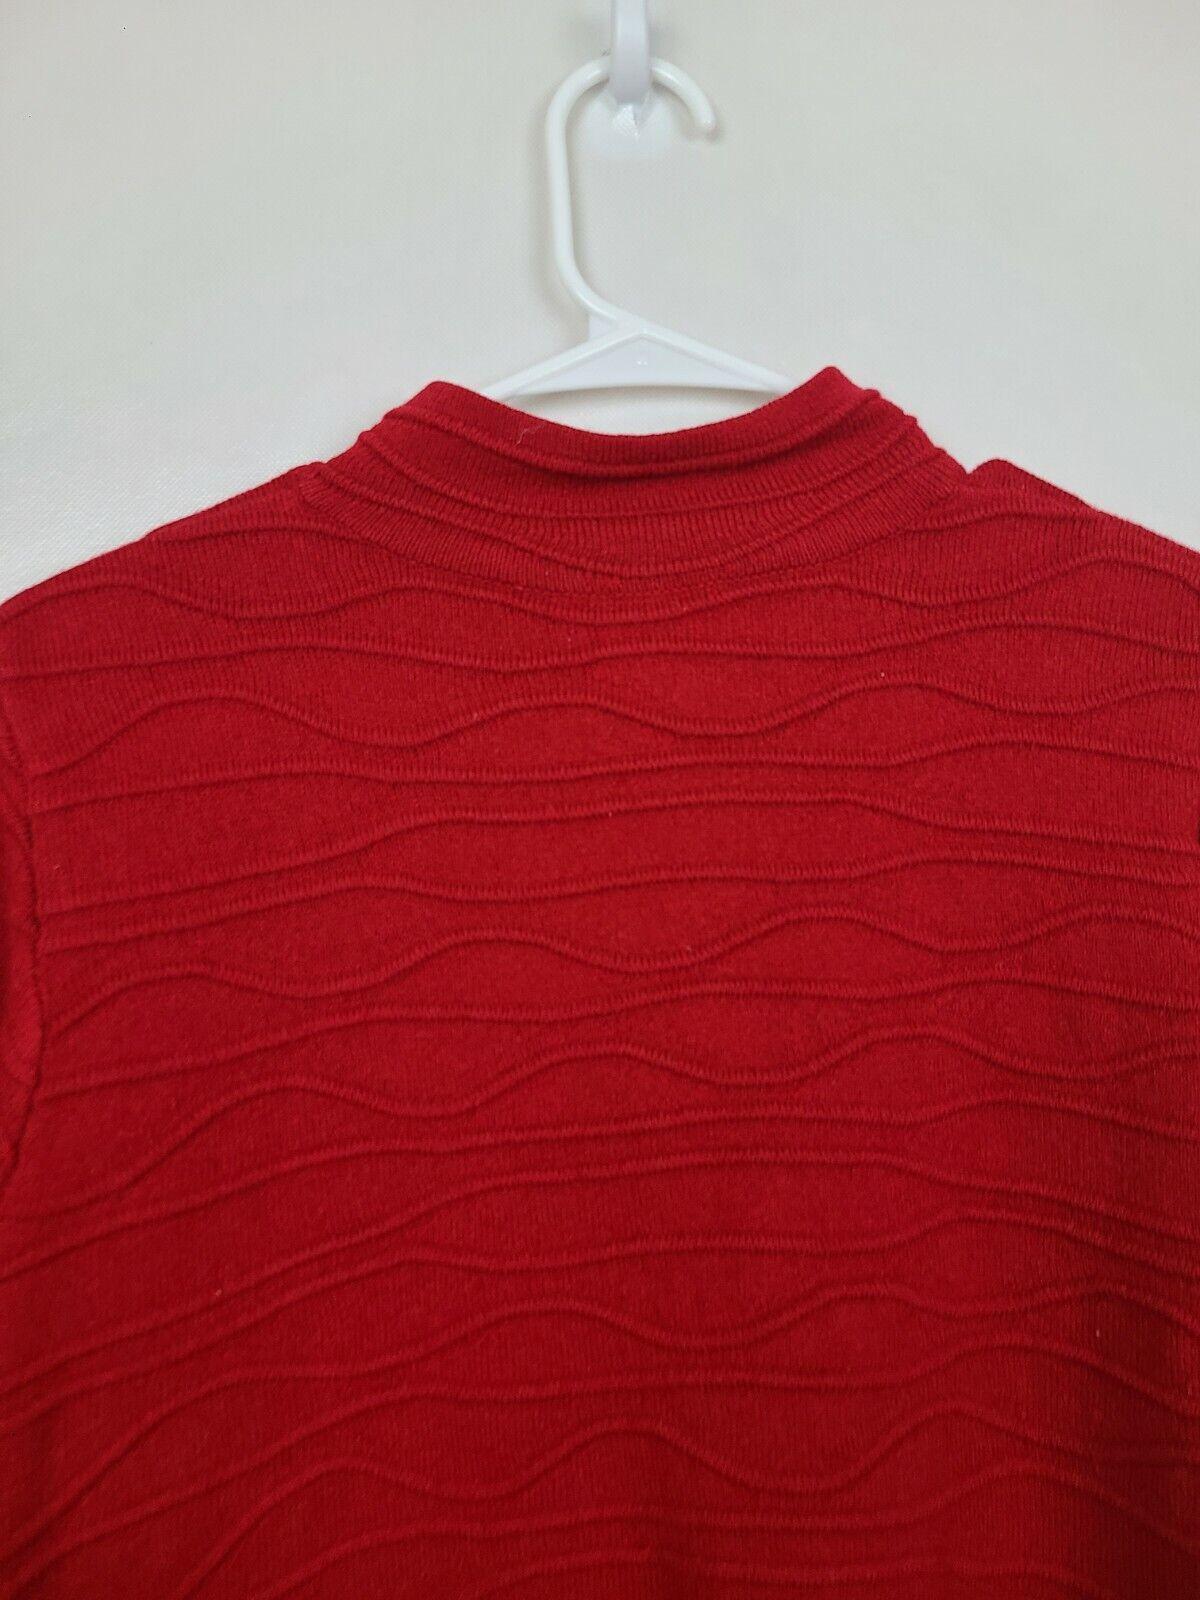 Coldwater Creek Womens Cardigan Sweater Medium Re… - image 4